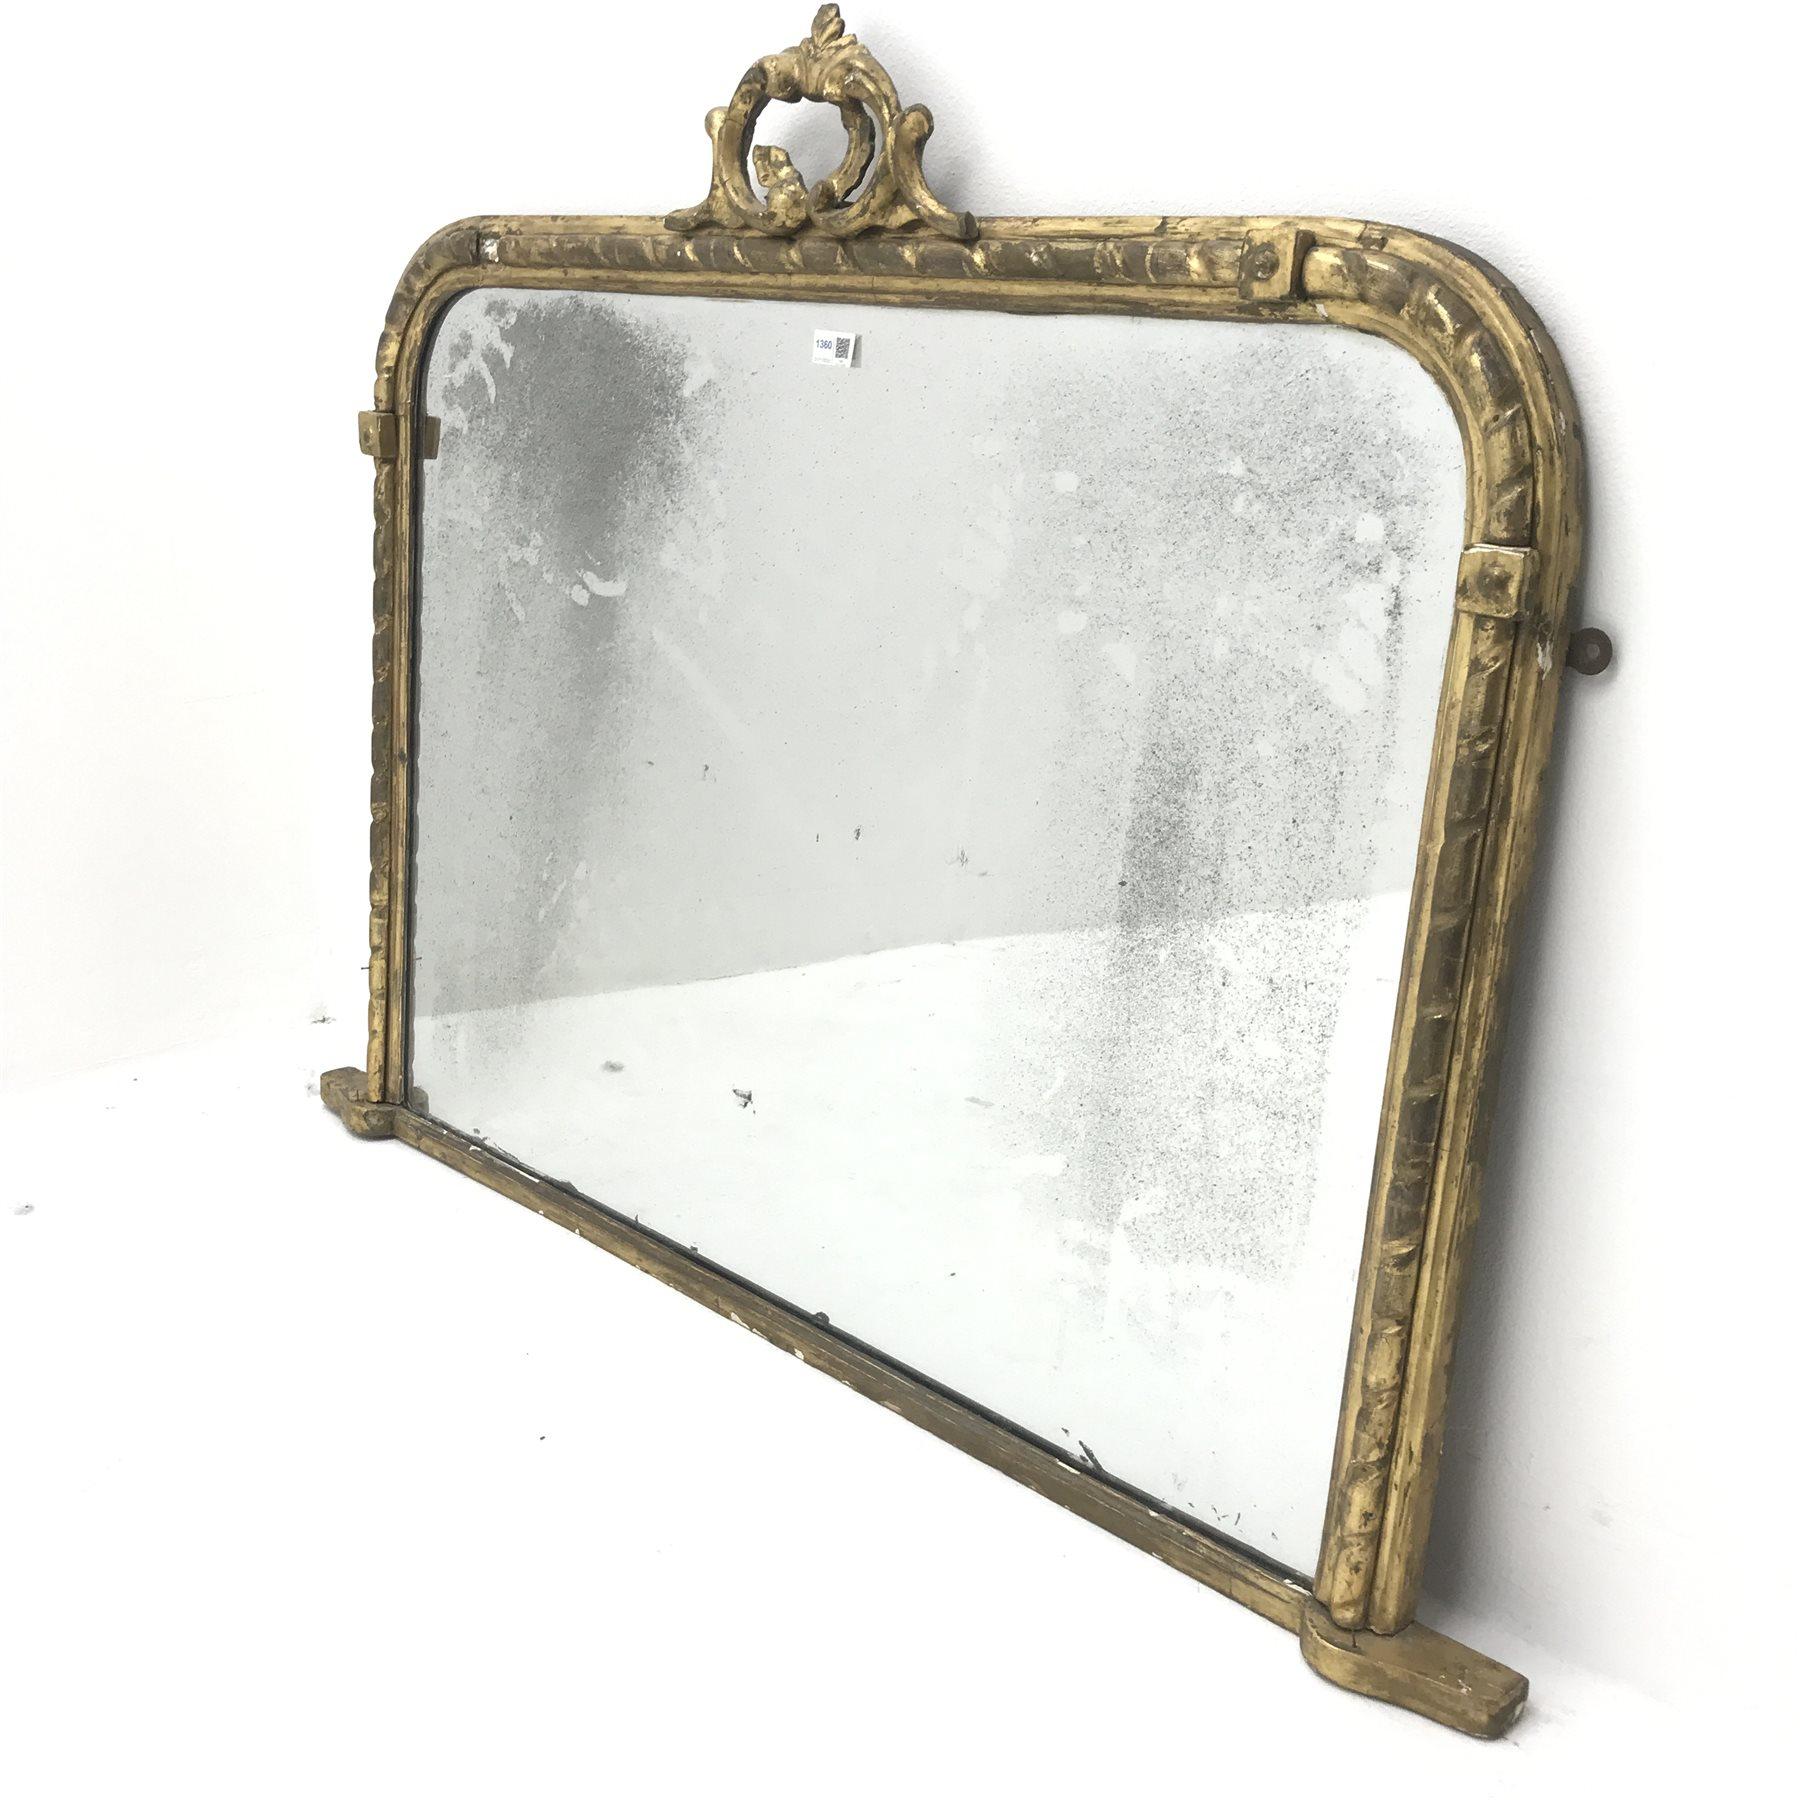 19th century gilt framed overmantle mirror, W122cm, H94cm